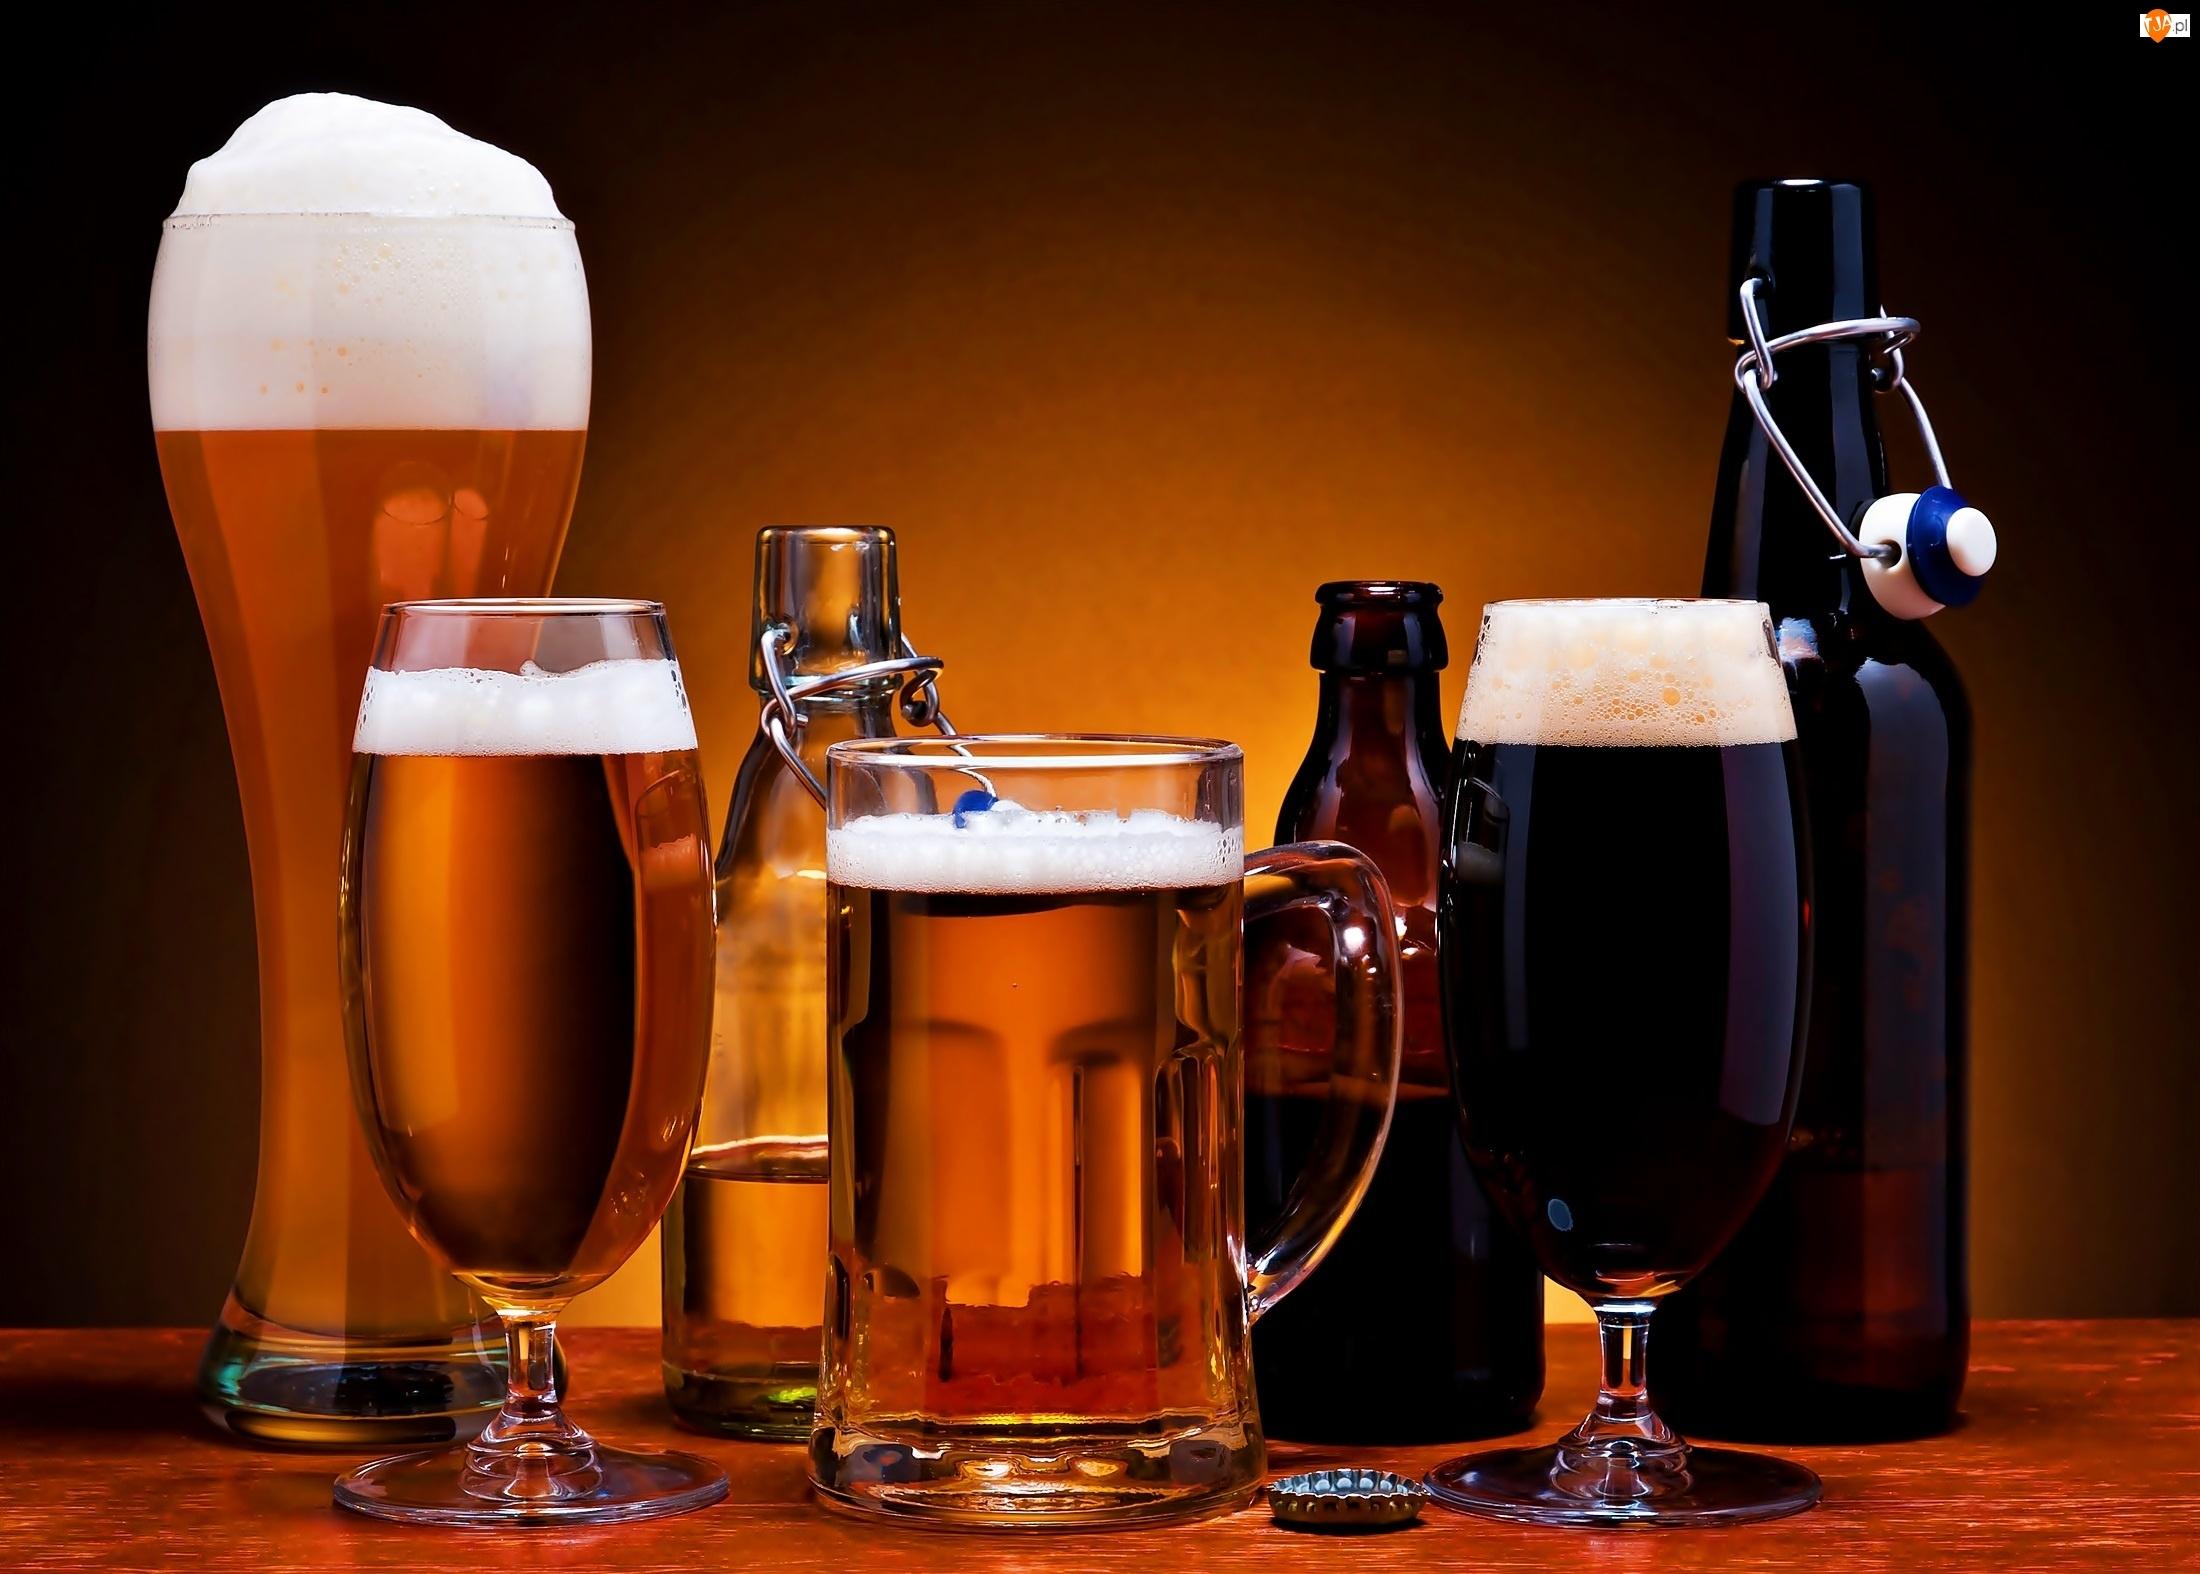 Piwo, Piana, Jasne, Ciemne